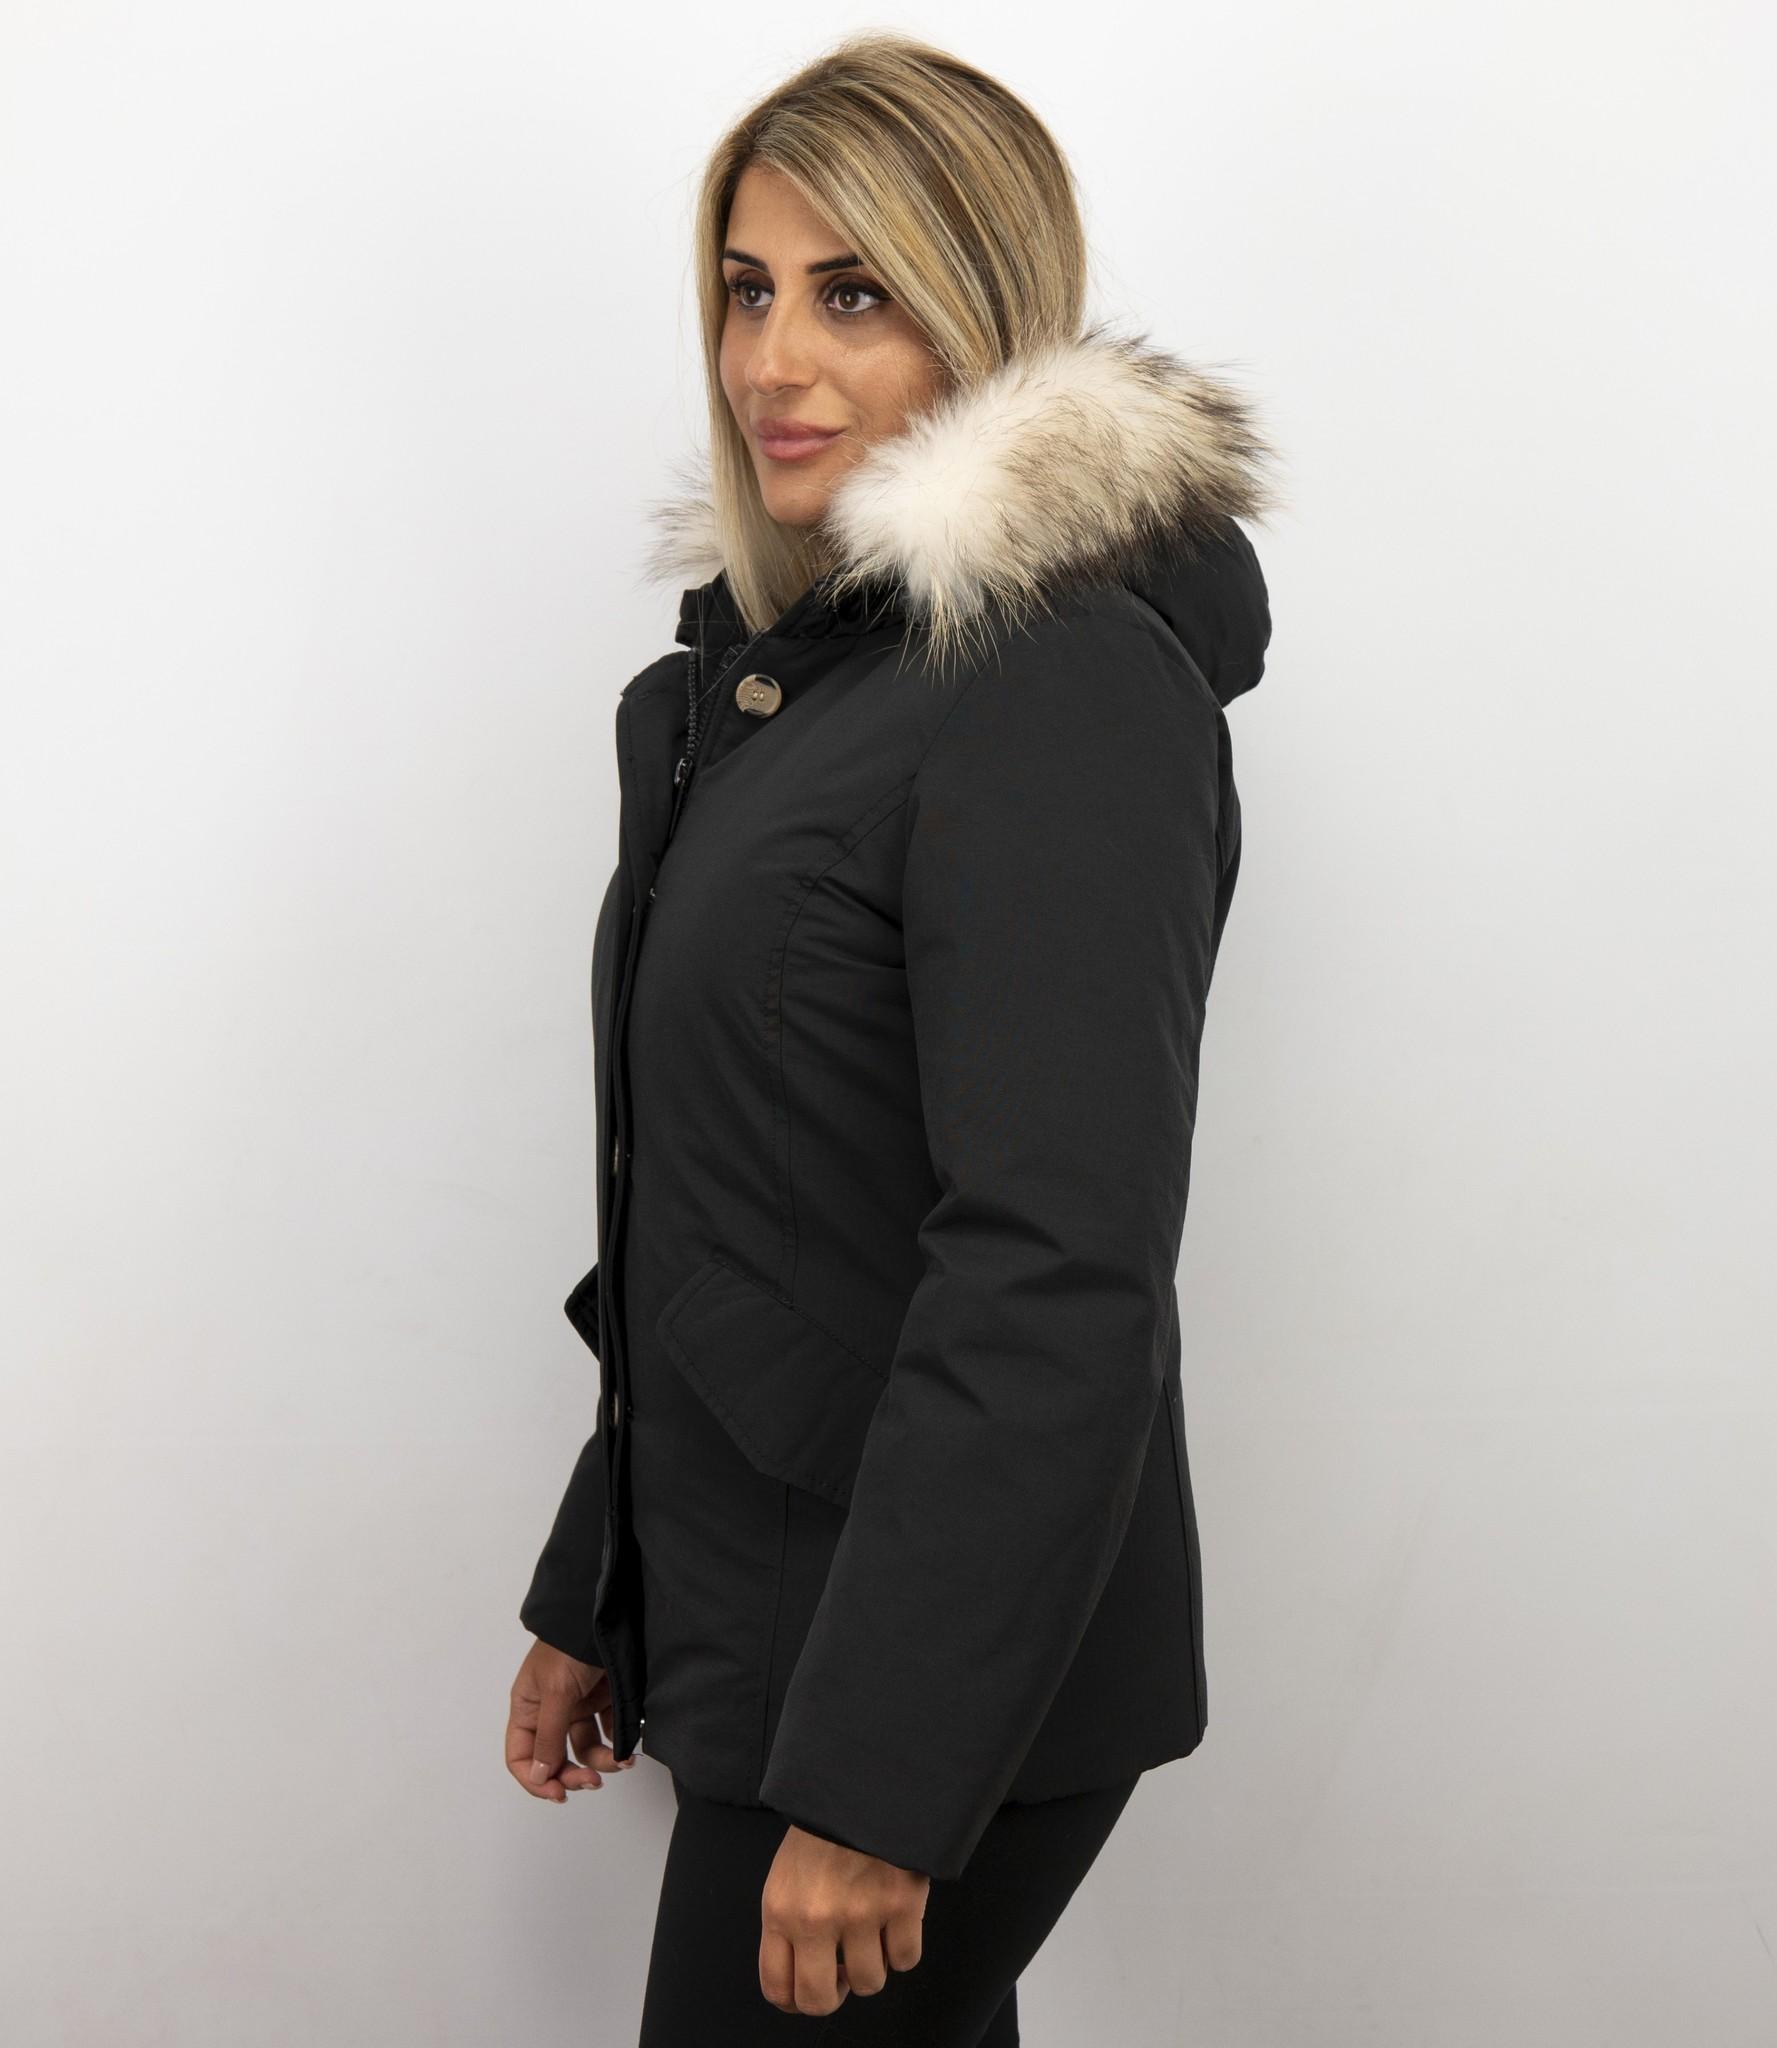 Matogla Dames Winterjas Wooly Kort Grote Witte Bontkraag Zwart